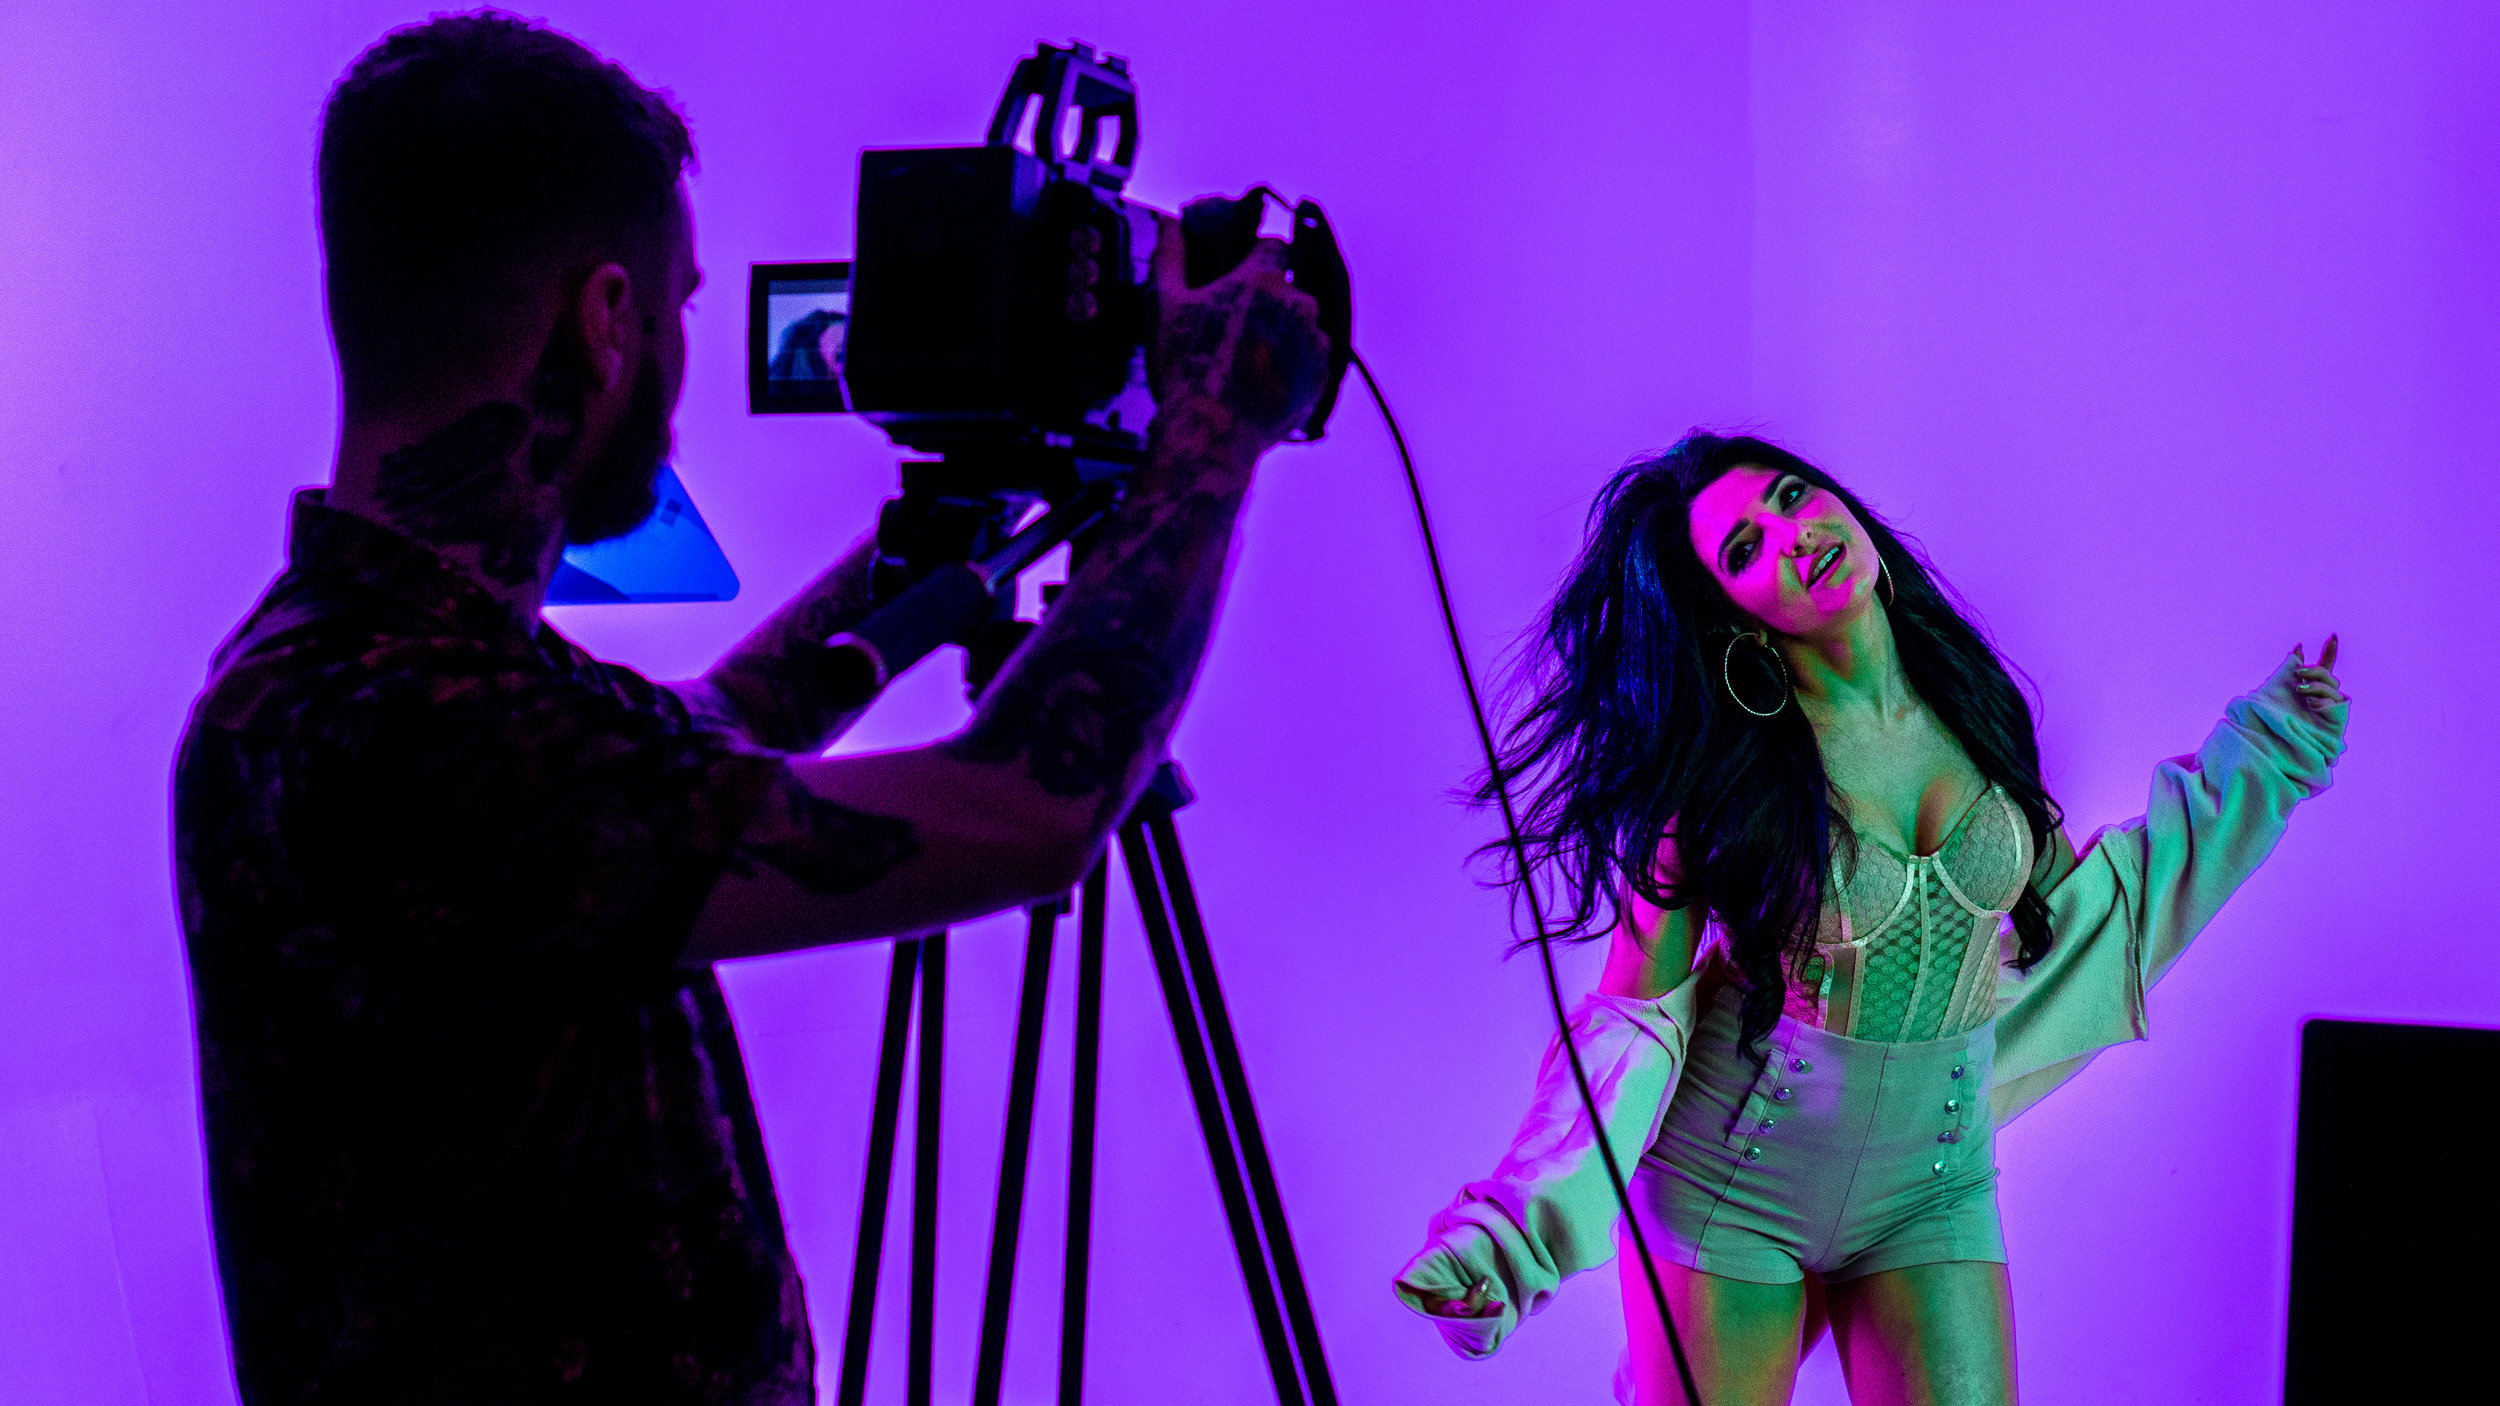 Aracara music video Ursa Mini 4.6K